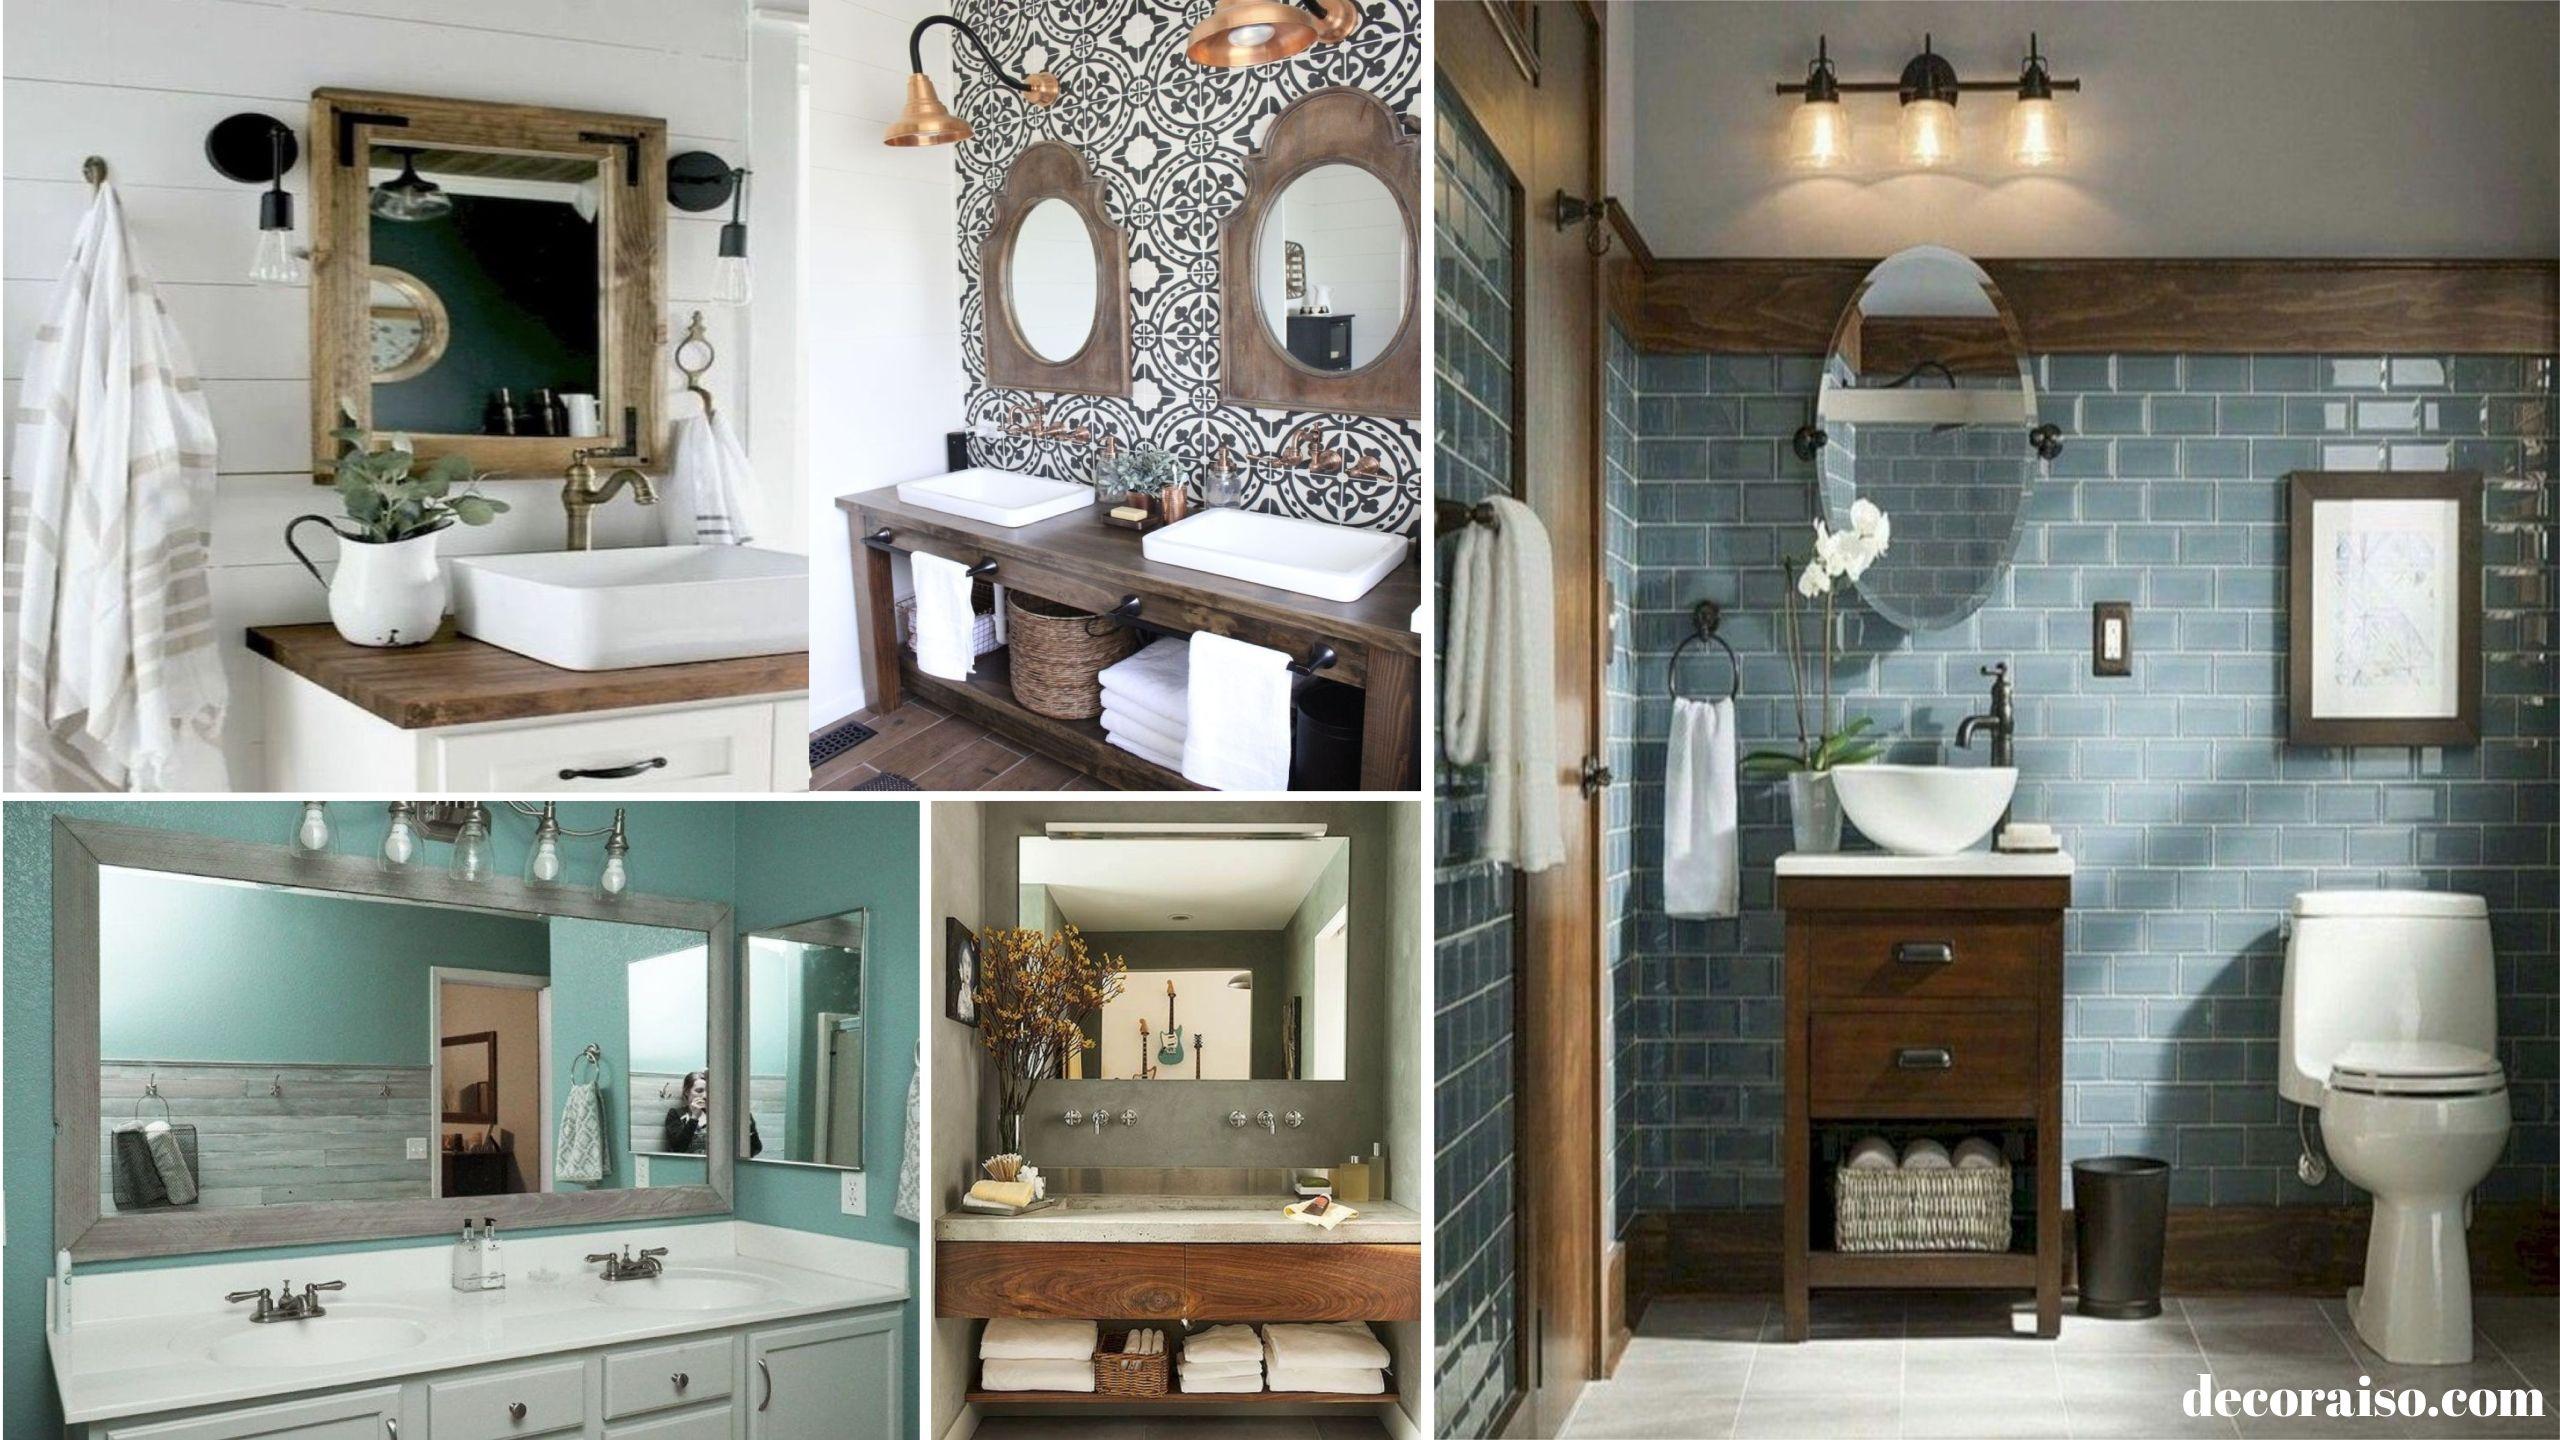 Breathtaking 49 Incredible Diy Bathroom Renovation Ideas Httpdecoraisocomindex